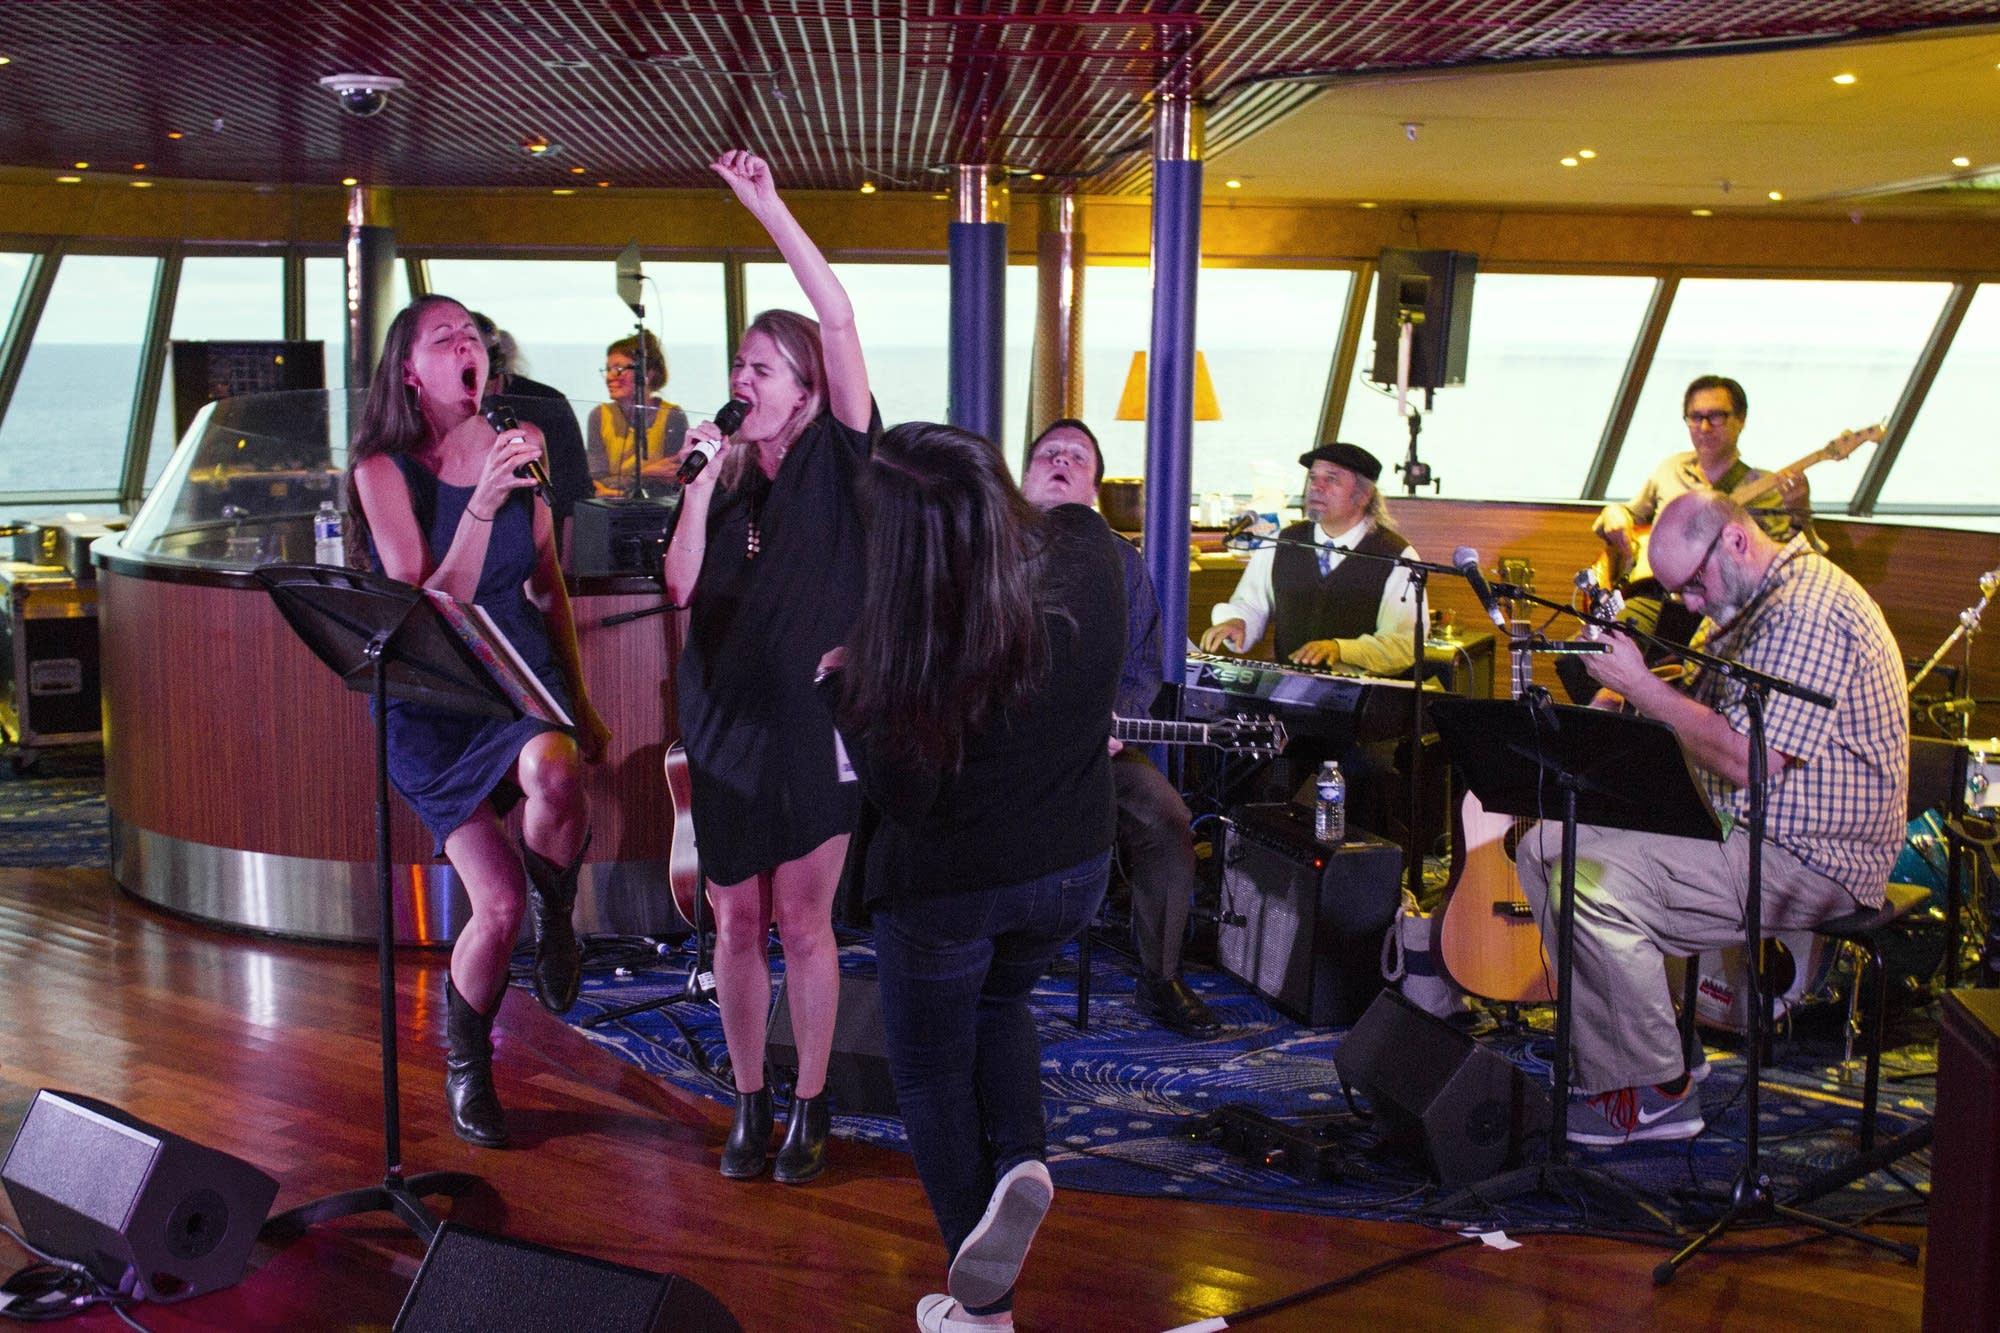 Oslo - 38 - Heather, Aoife, Christine, band